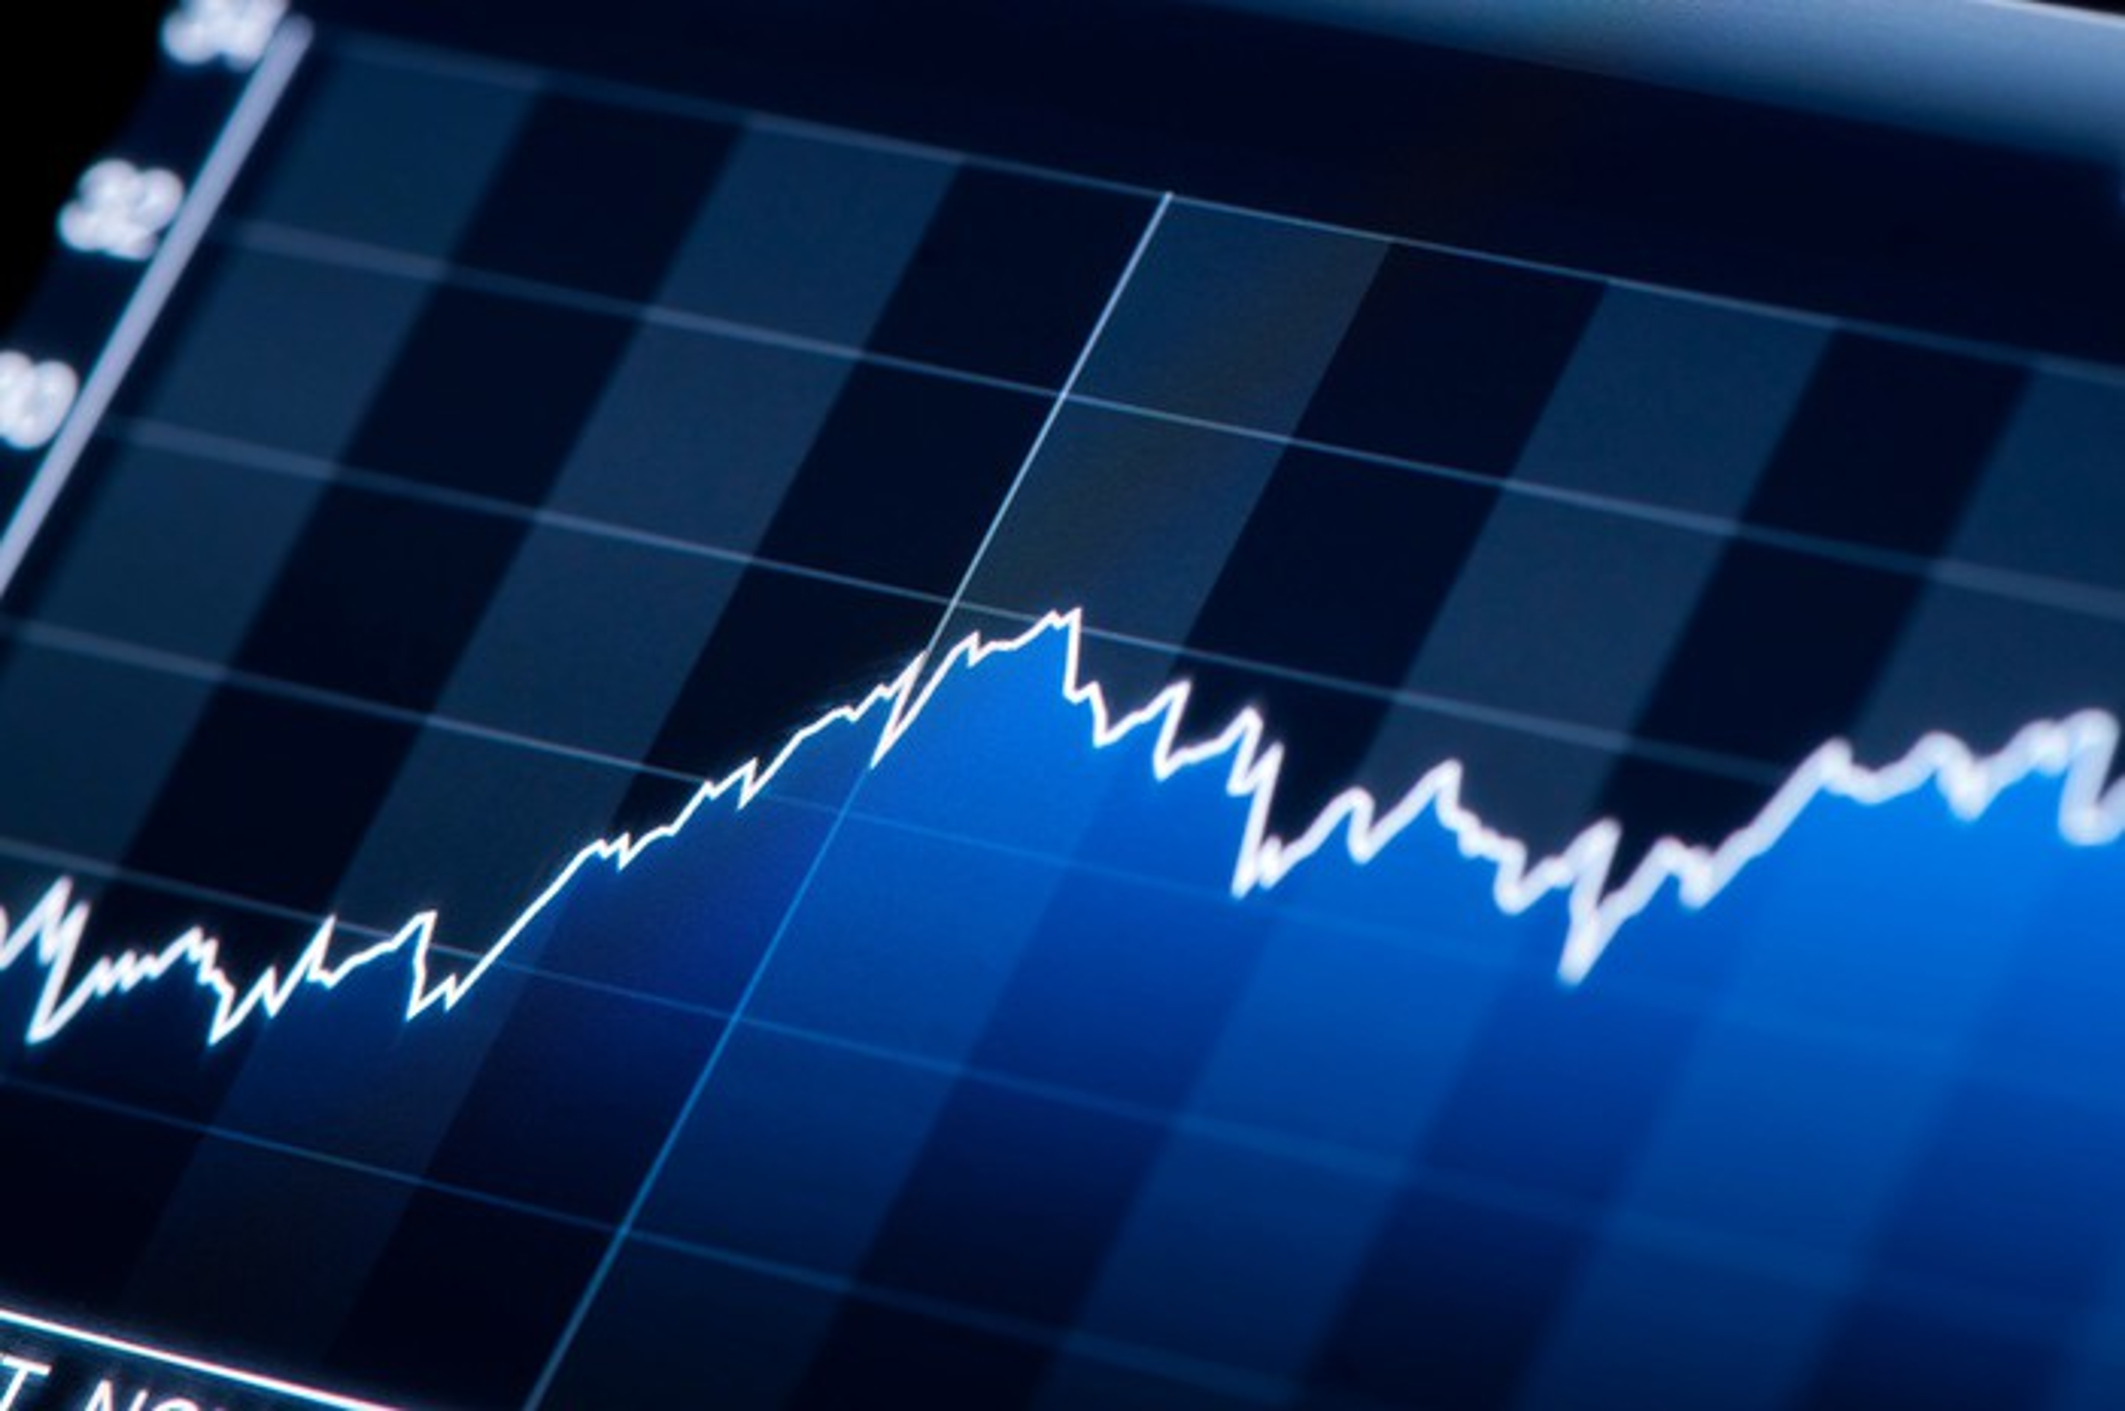 Stock chart rising.